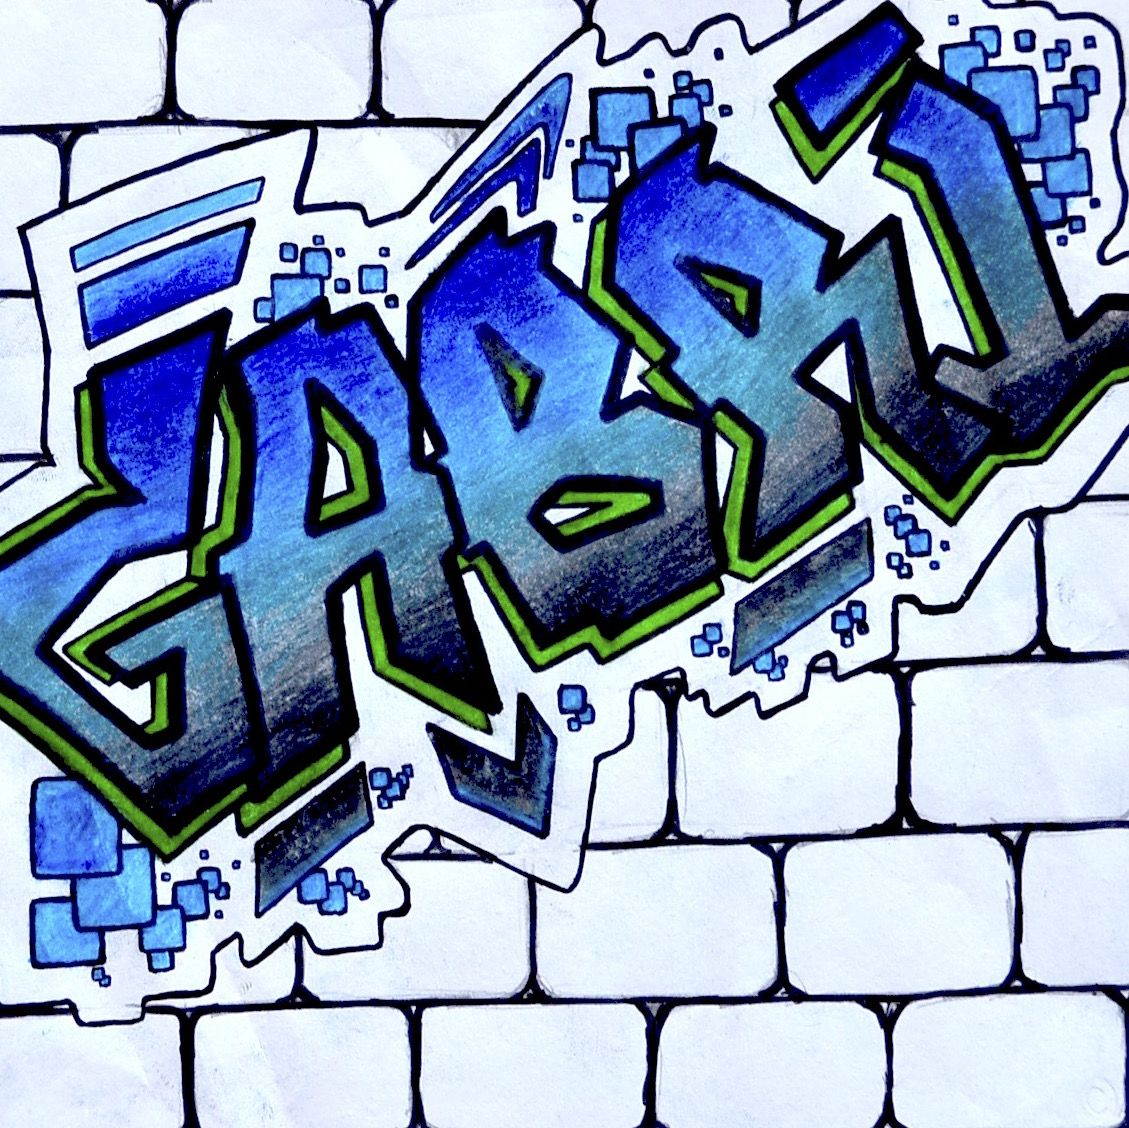 _dsc Graffiti Names Graffiti Writing Graffiti Lettering Graffiti Styles Graffiti Murals